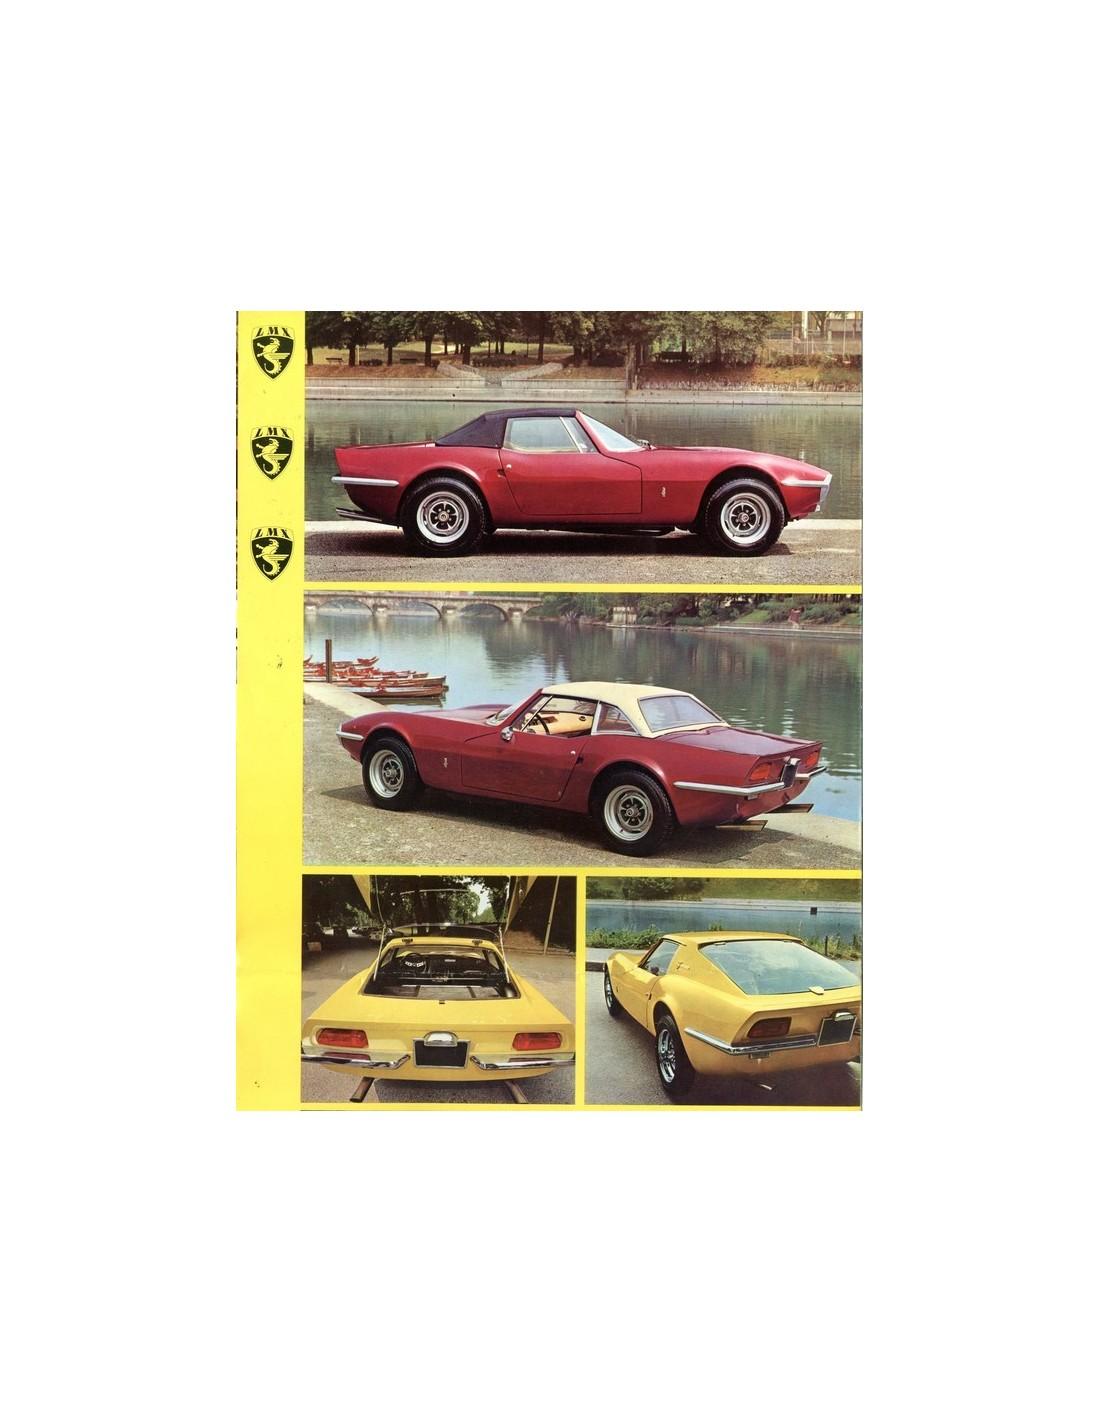 1969 Lmx 2300 Hcs Coupe Spyder Brochure Italian